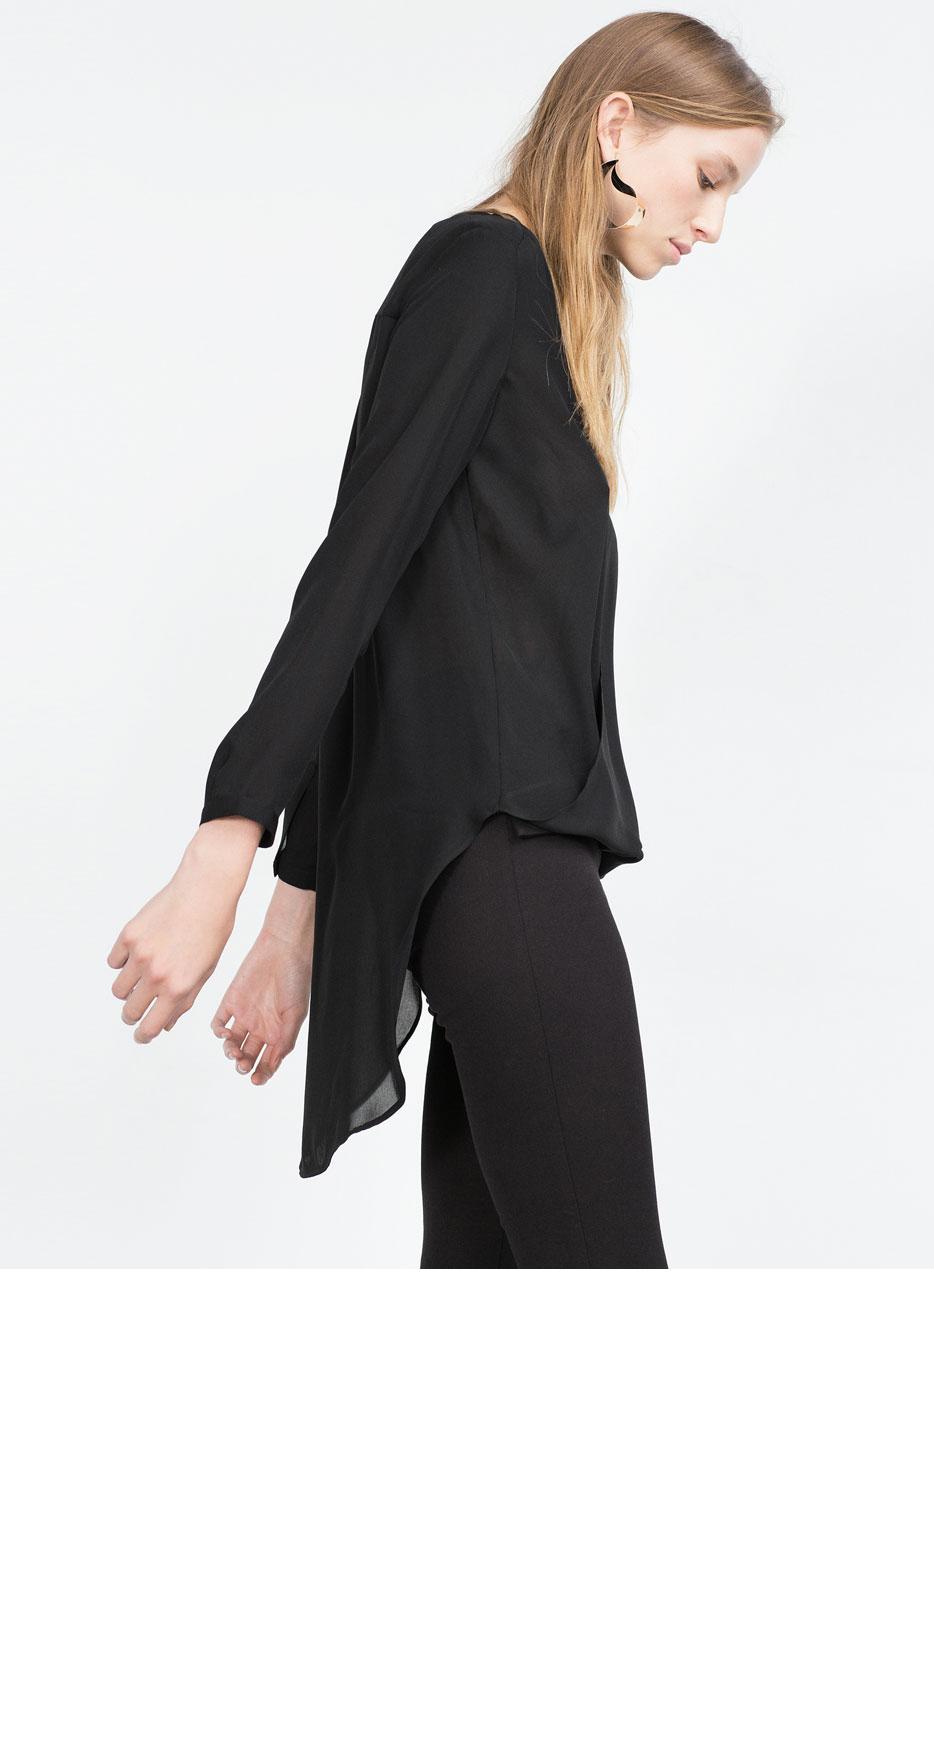 Zara - blouse